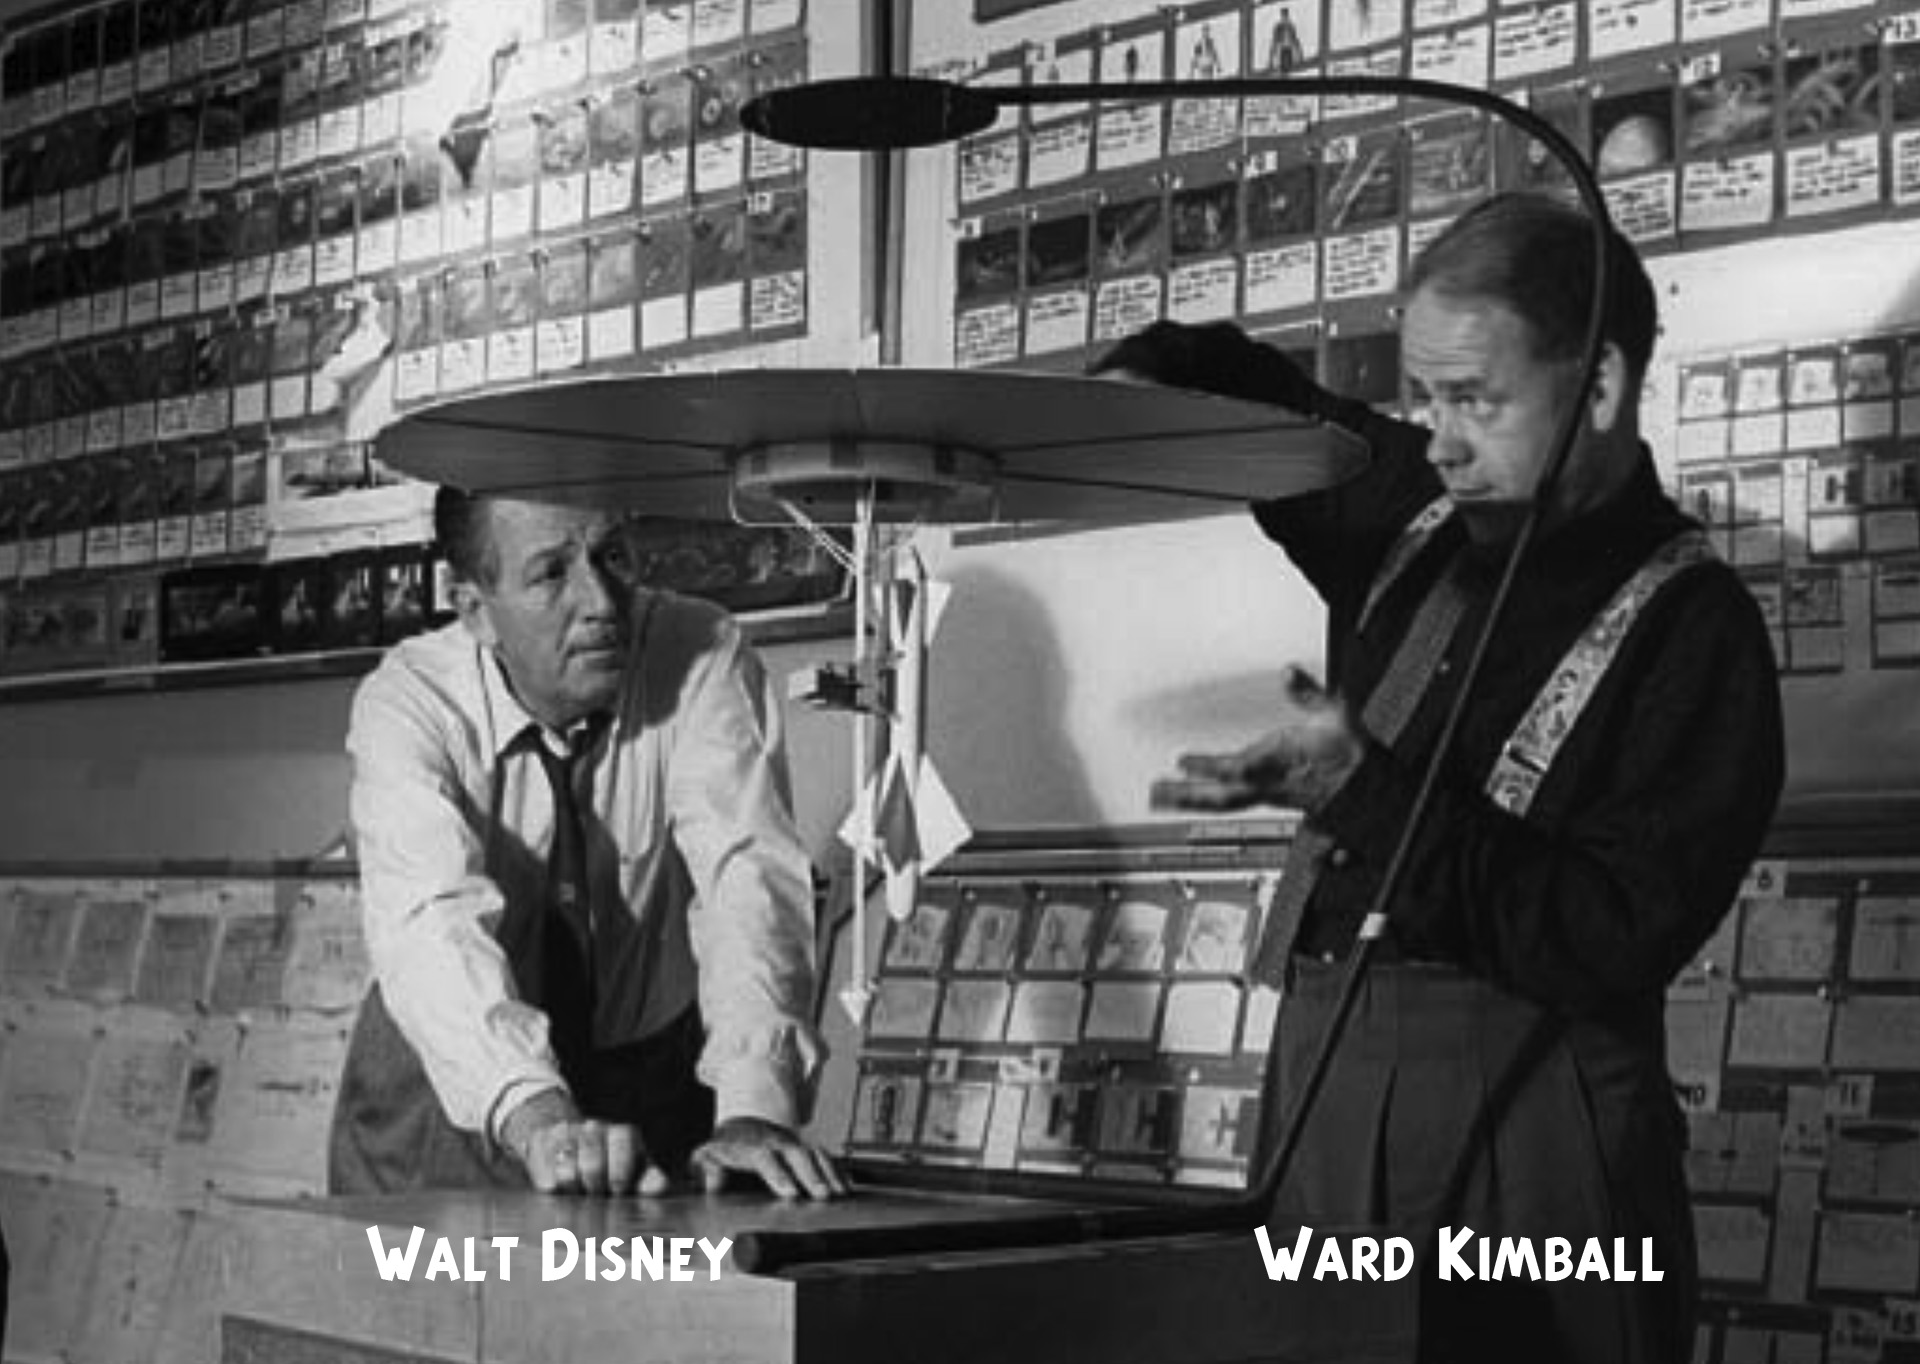 Walt Disney and Ward Kimball